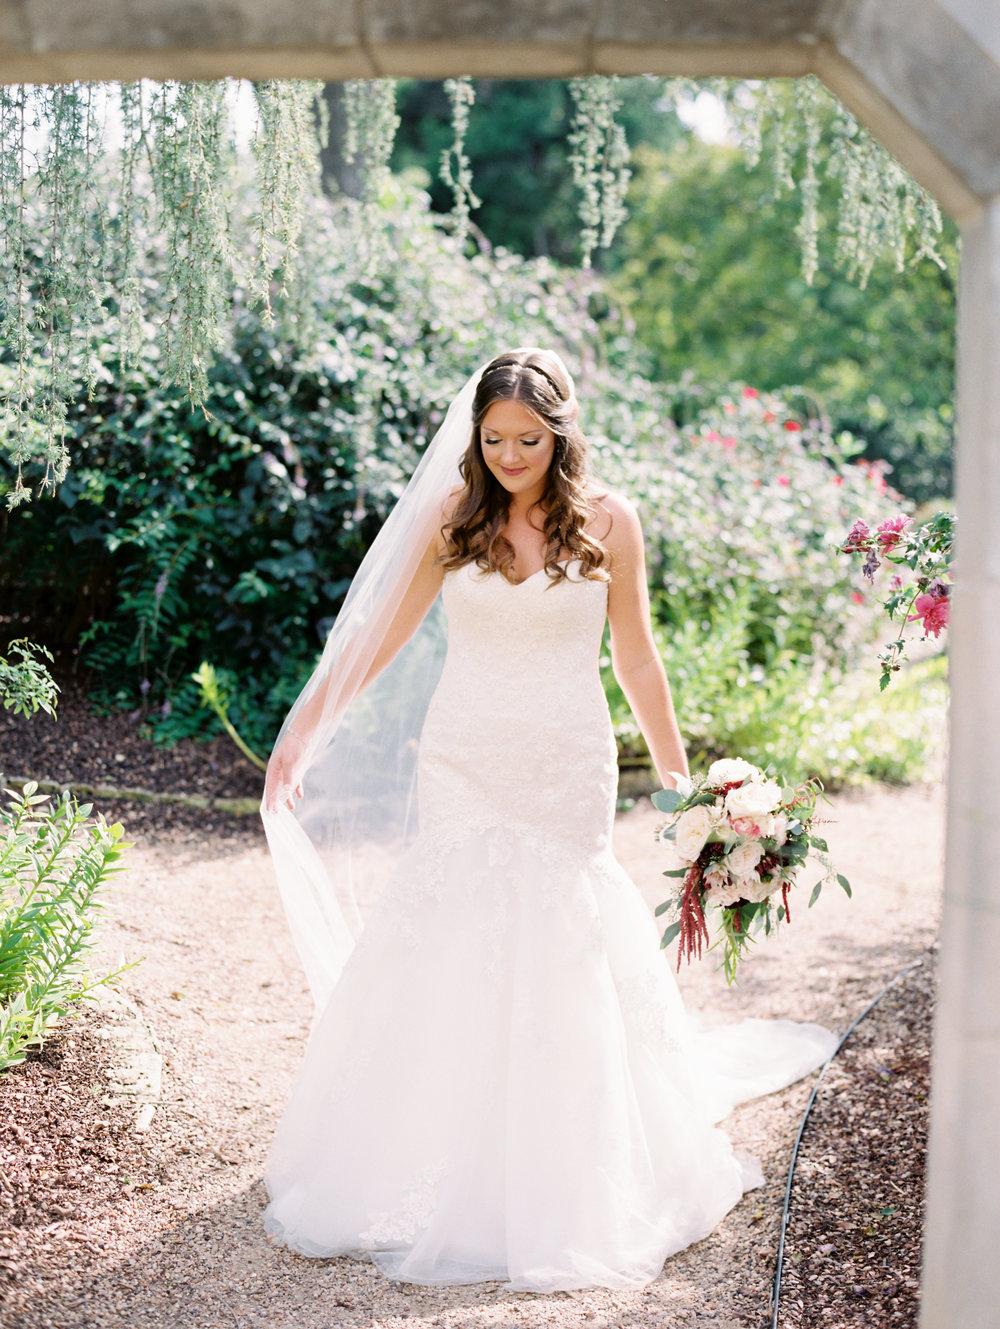 dallas-arboretum-botanical-garden-bridals-ar-photography-dana-45.jpg